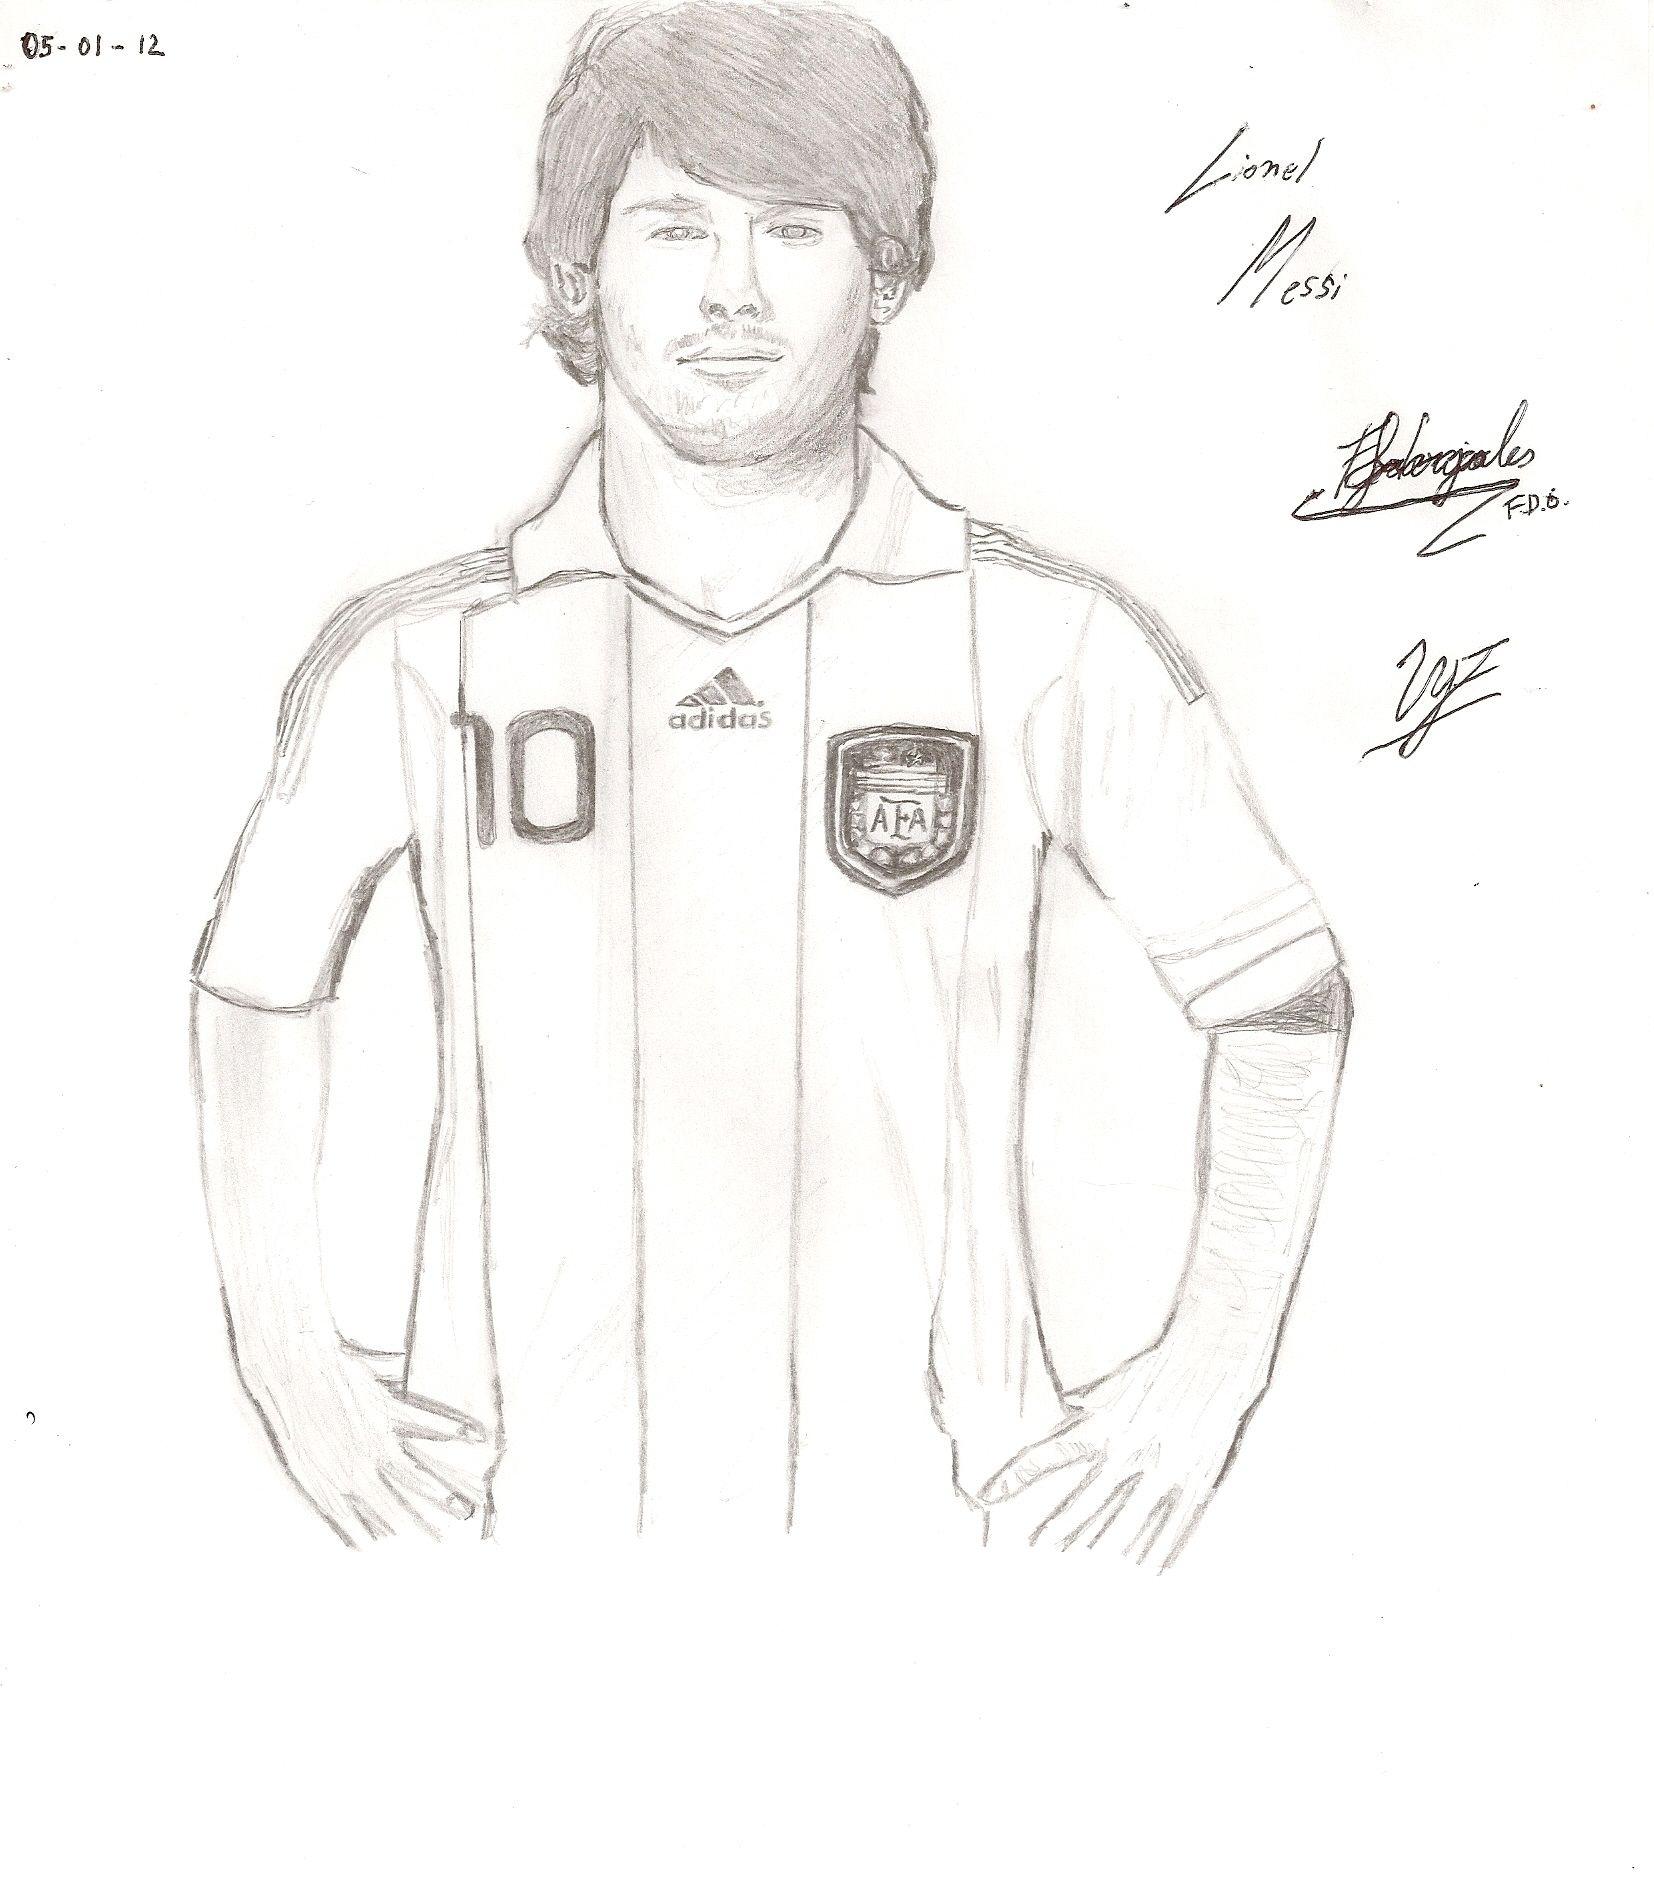 1654x1879 Lionel Messi Wallpapercraft Ronaldo Messi Wallpaper